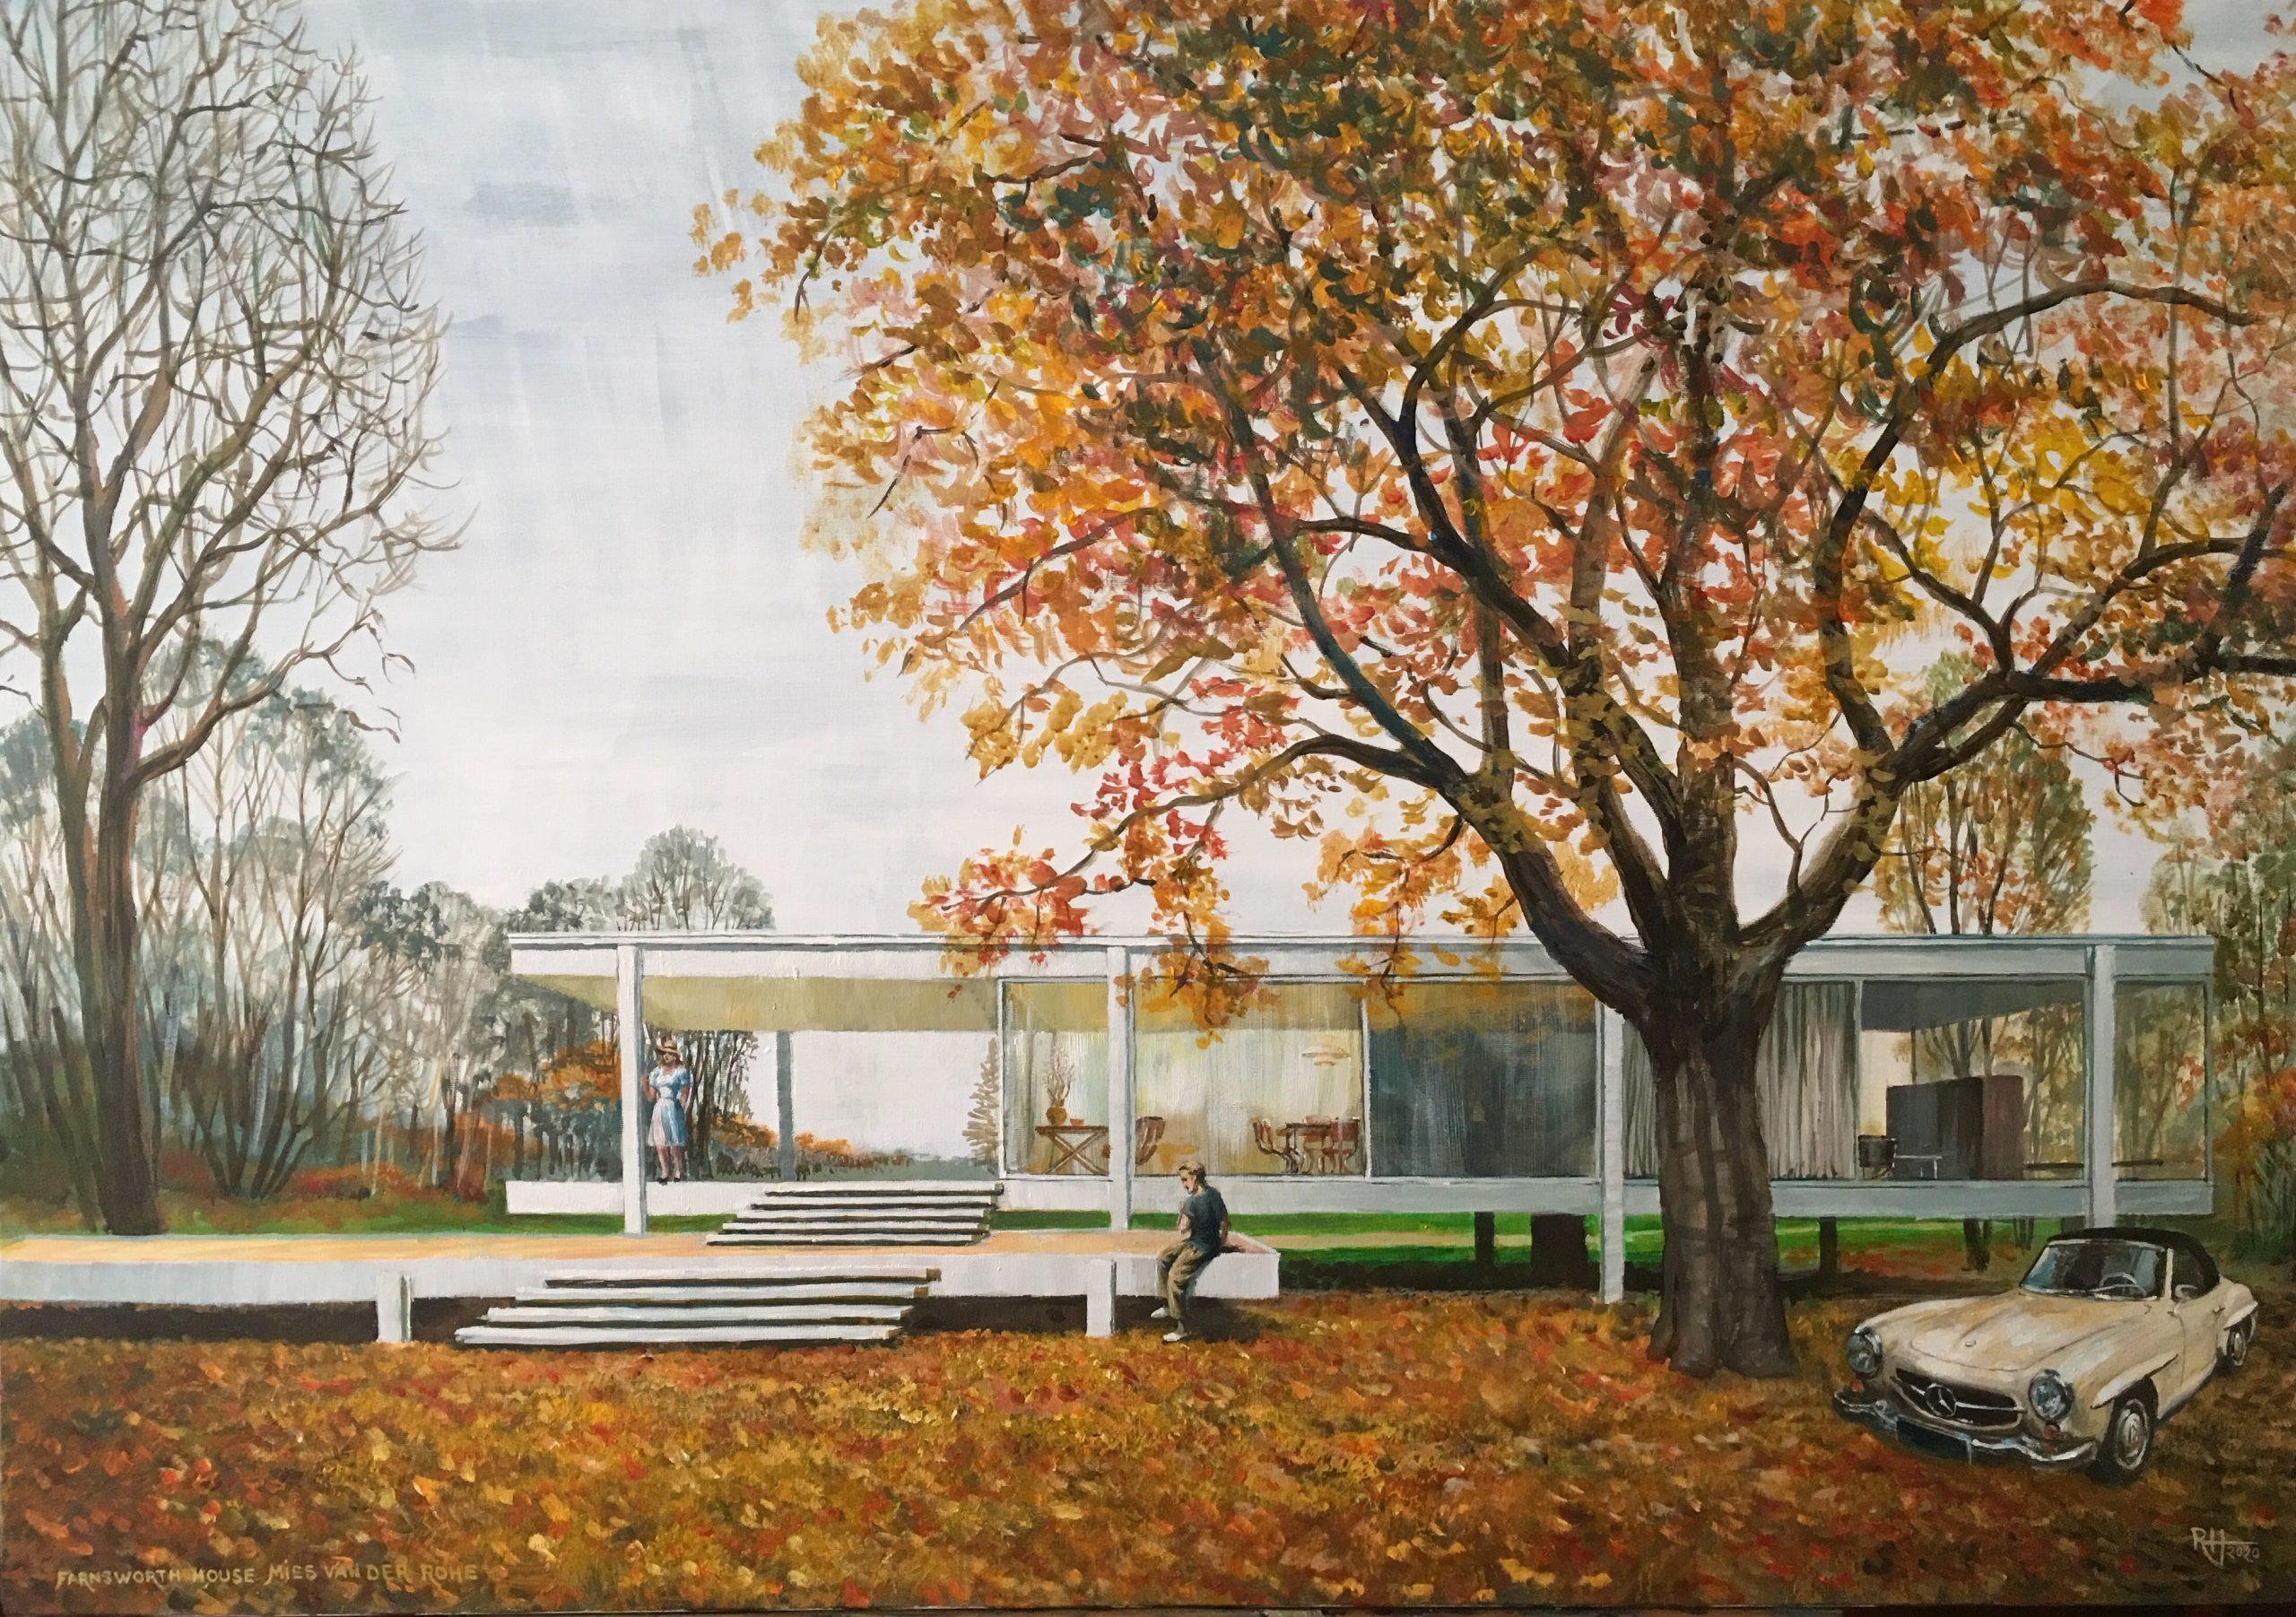 Académie Lyonnaise de peinture, Académie Lyonnaise de peinture, HARLAND Richard